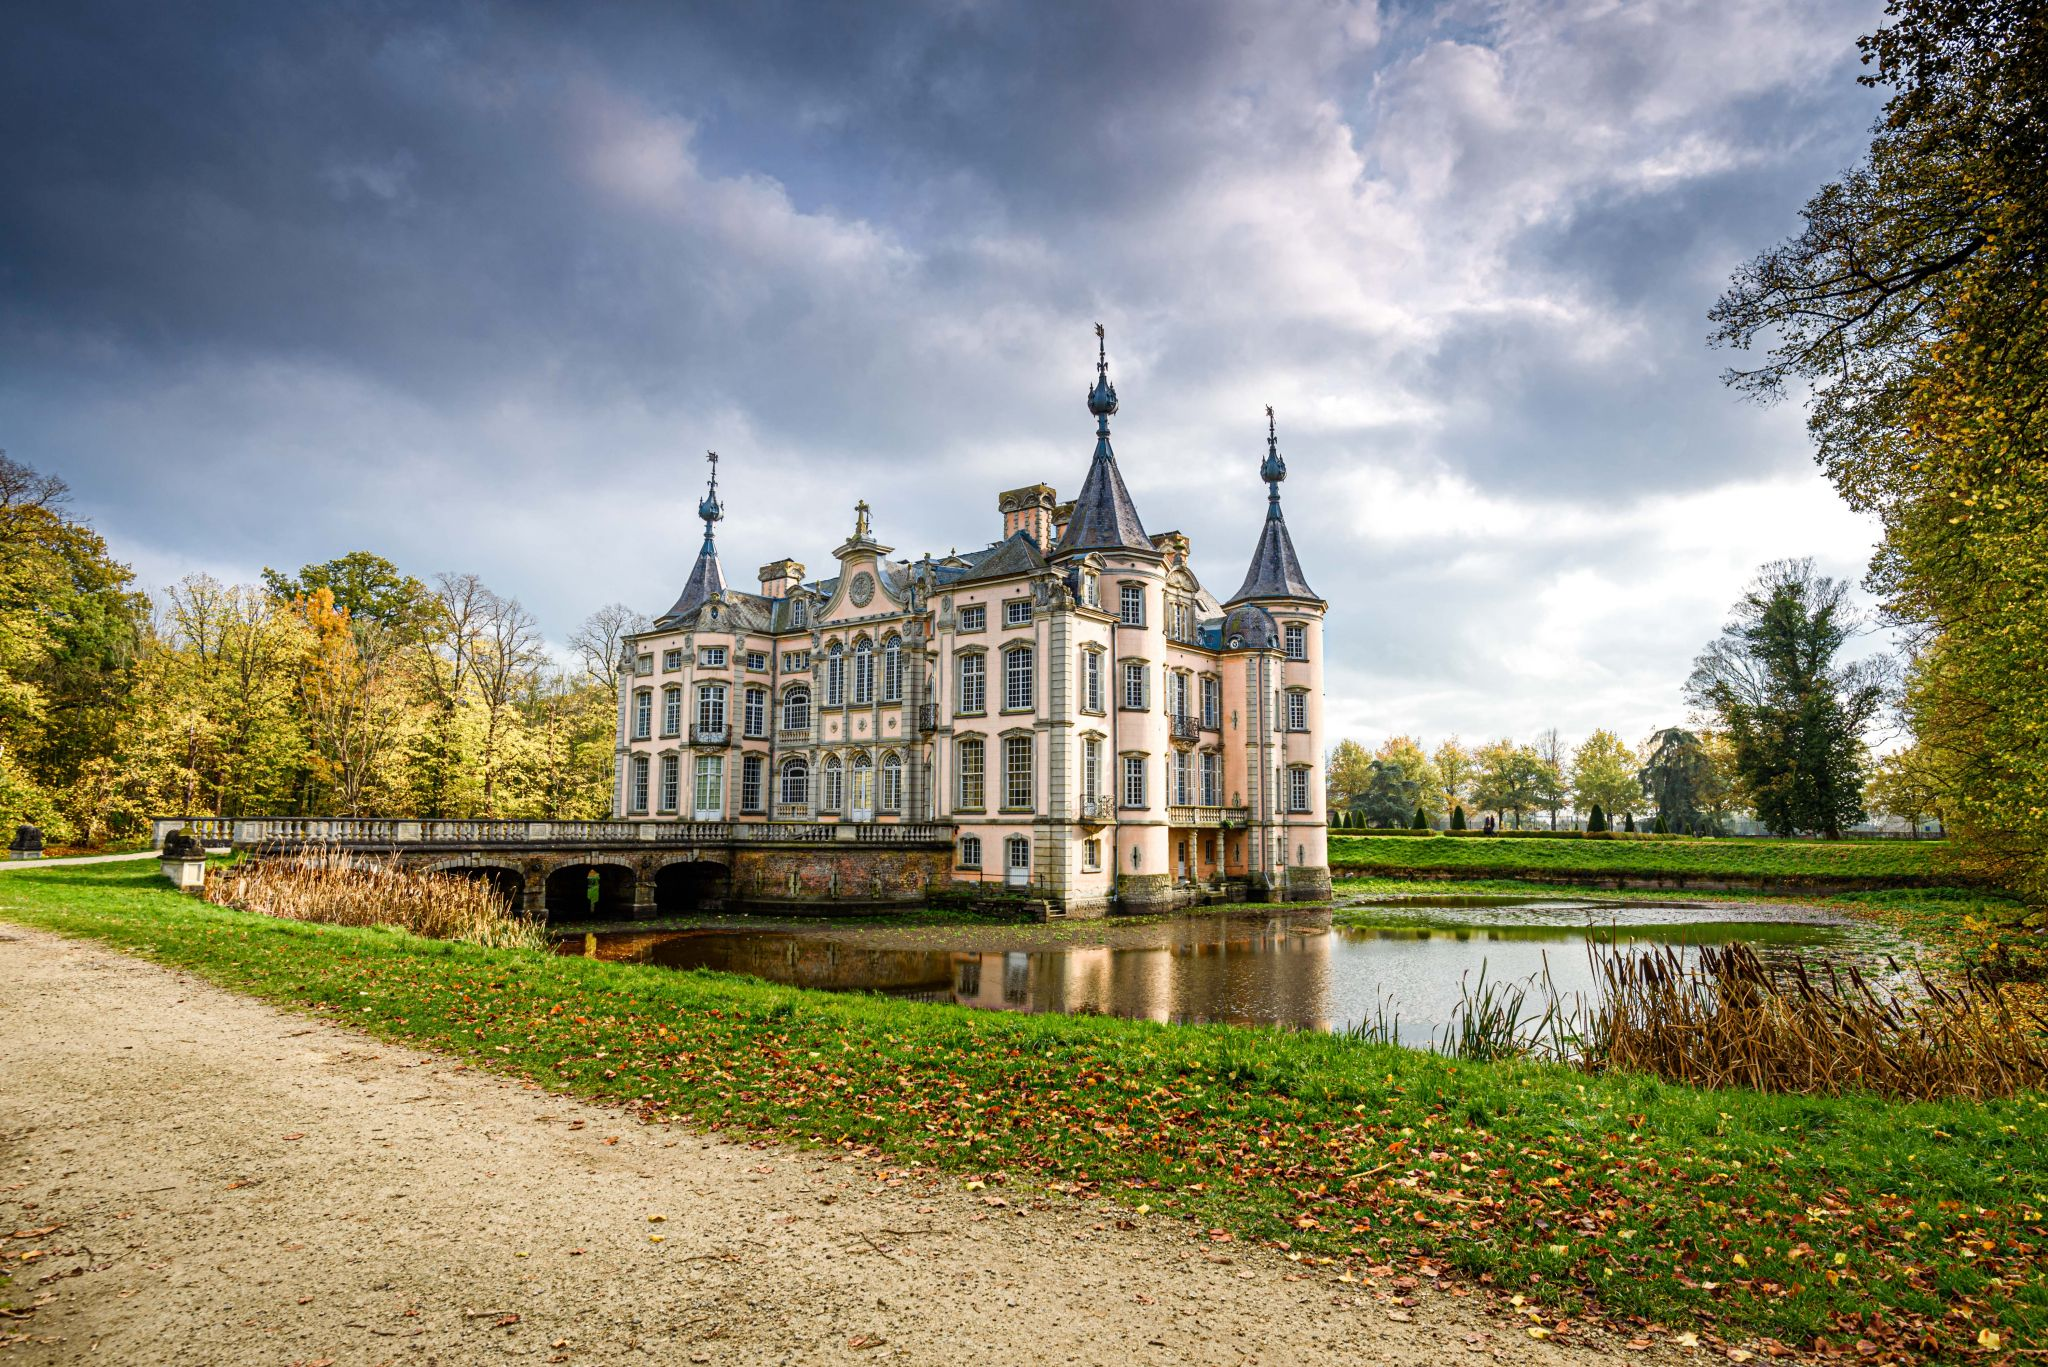 Poeke Castle in Flanders, Belgium